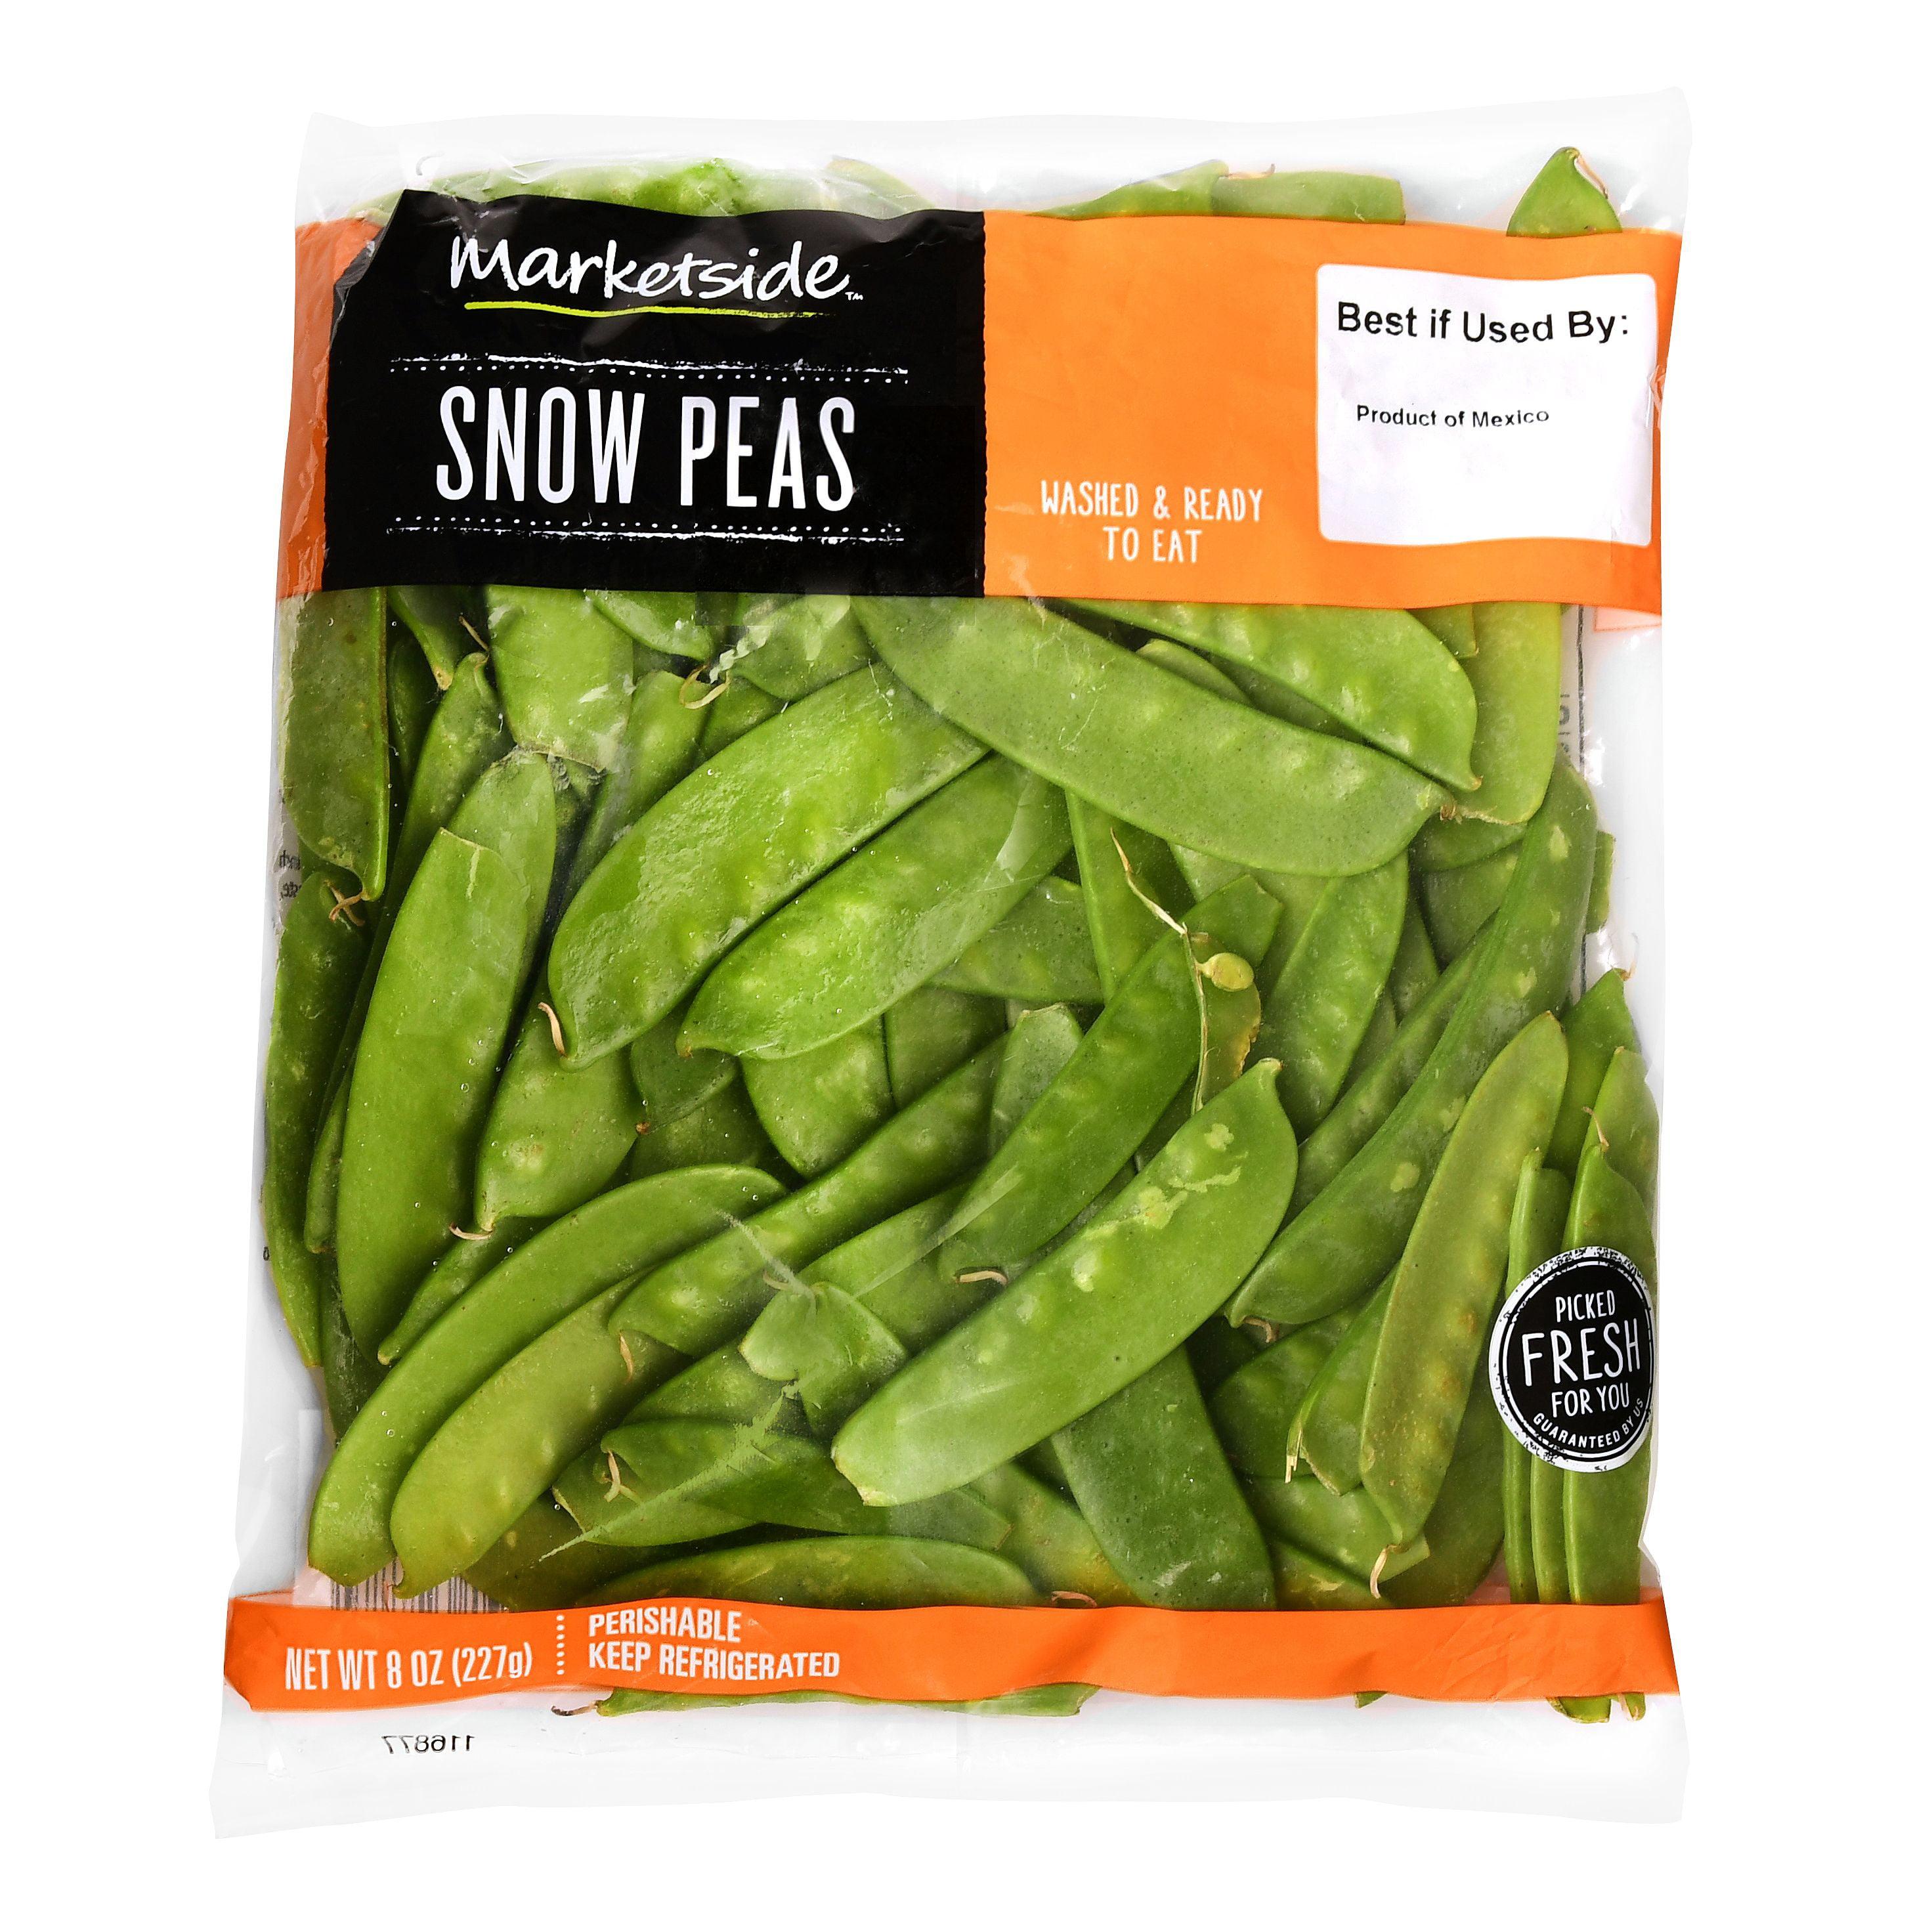 marketside snow peas 8 oz walmart com